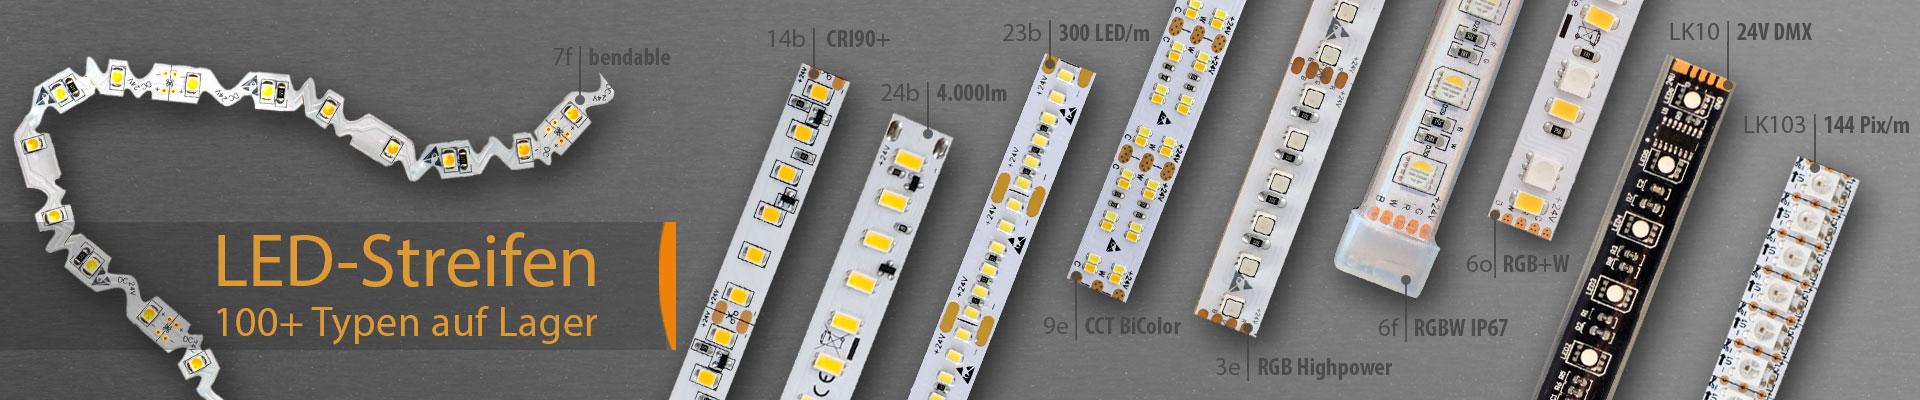 Teaser LED-Streifen